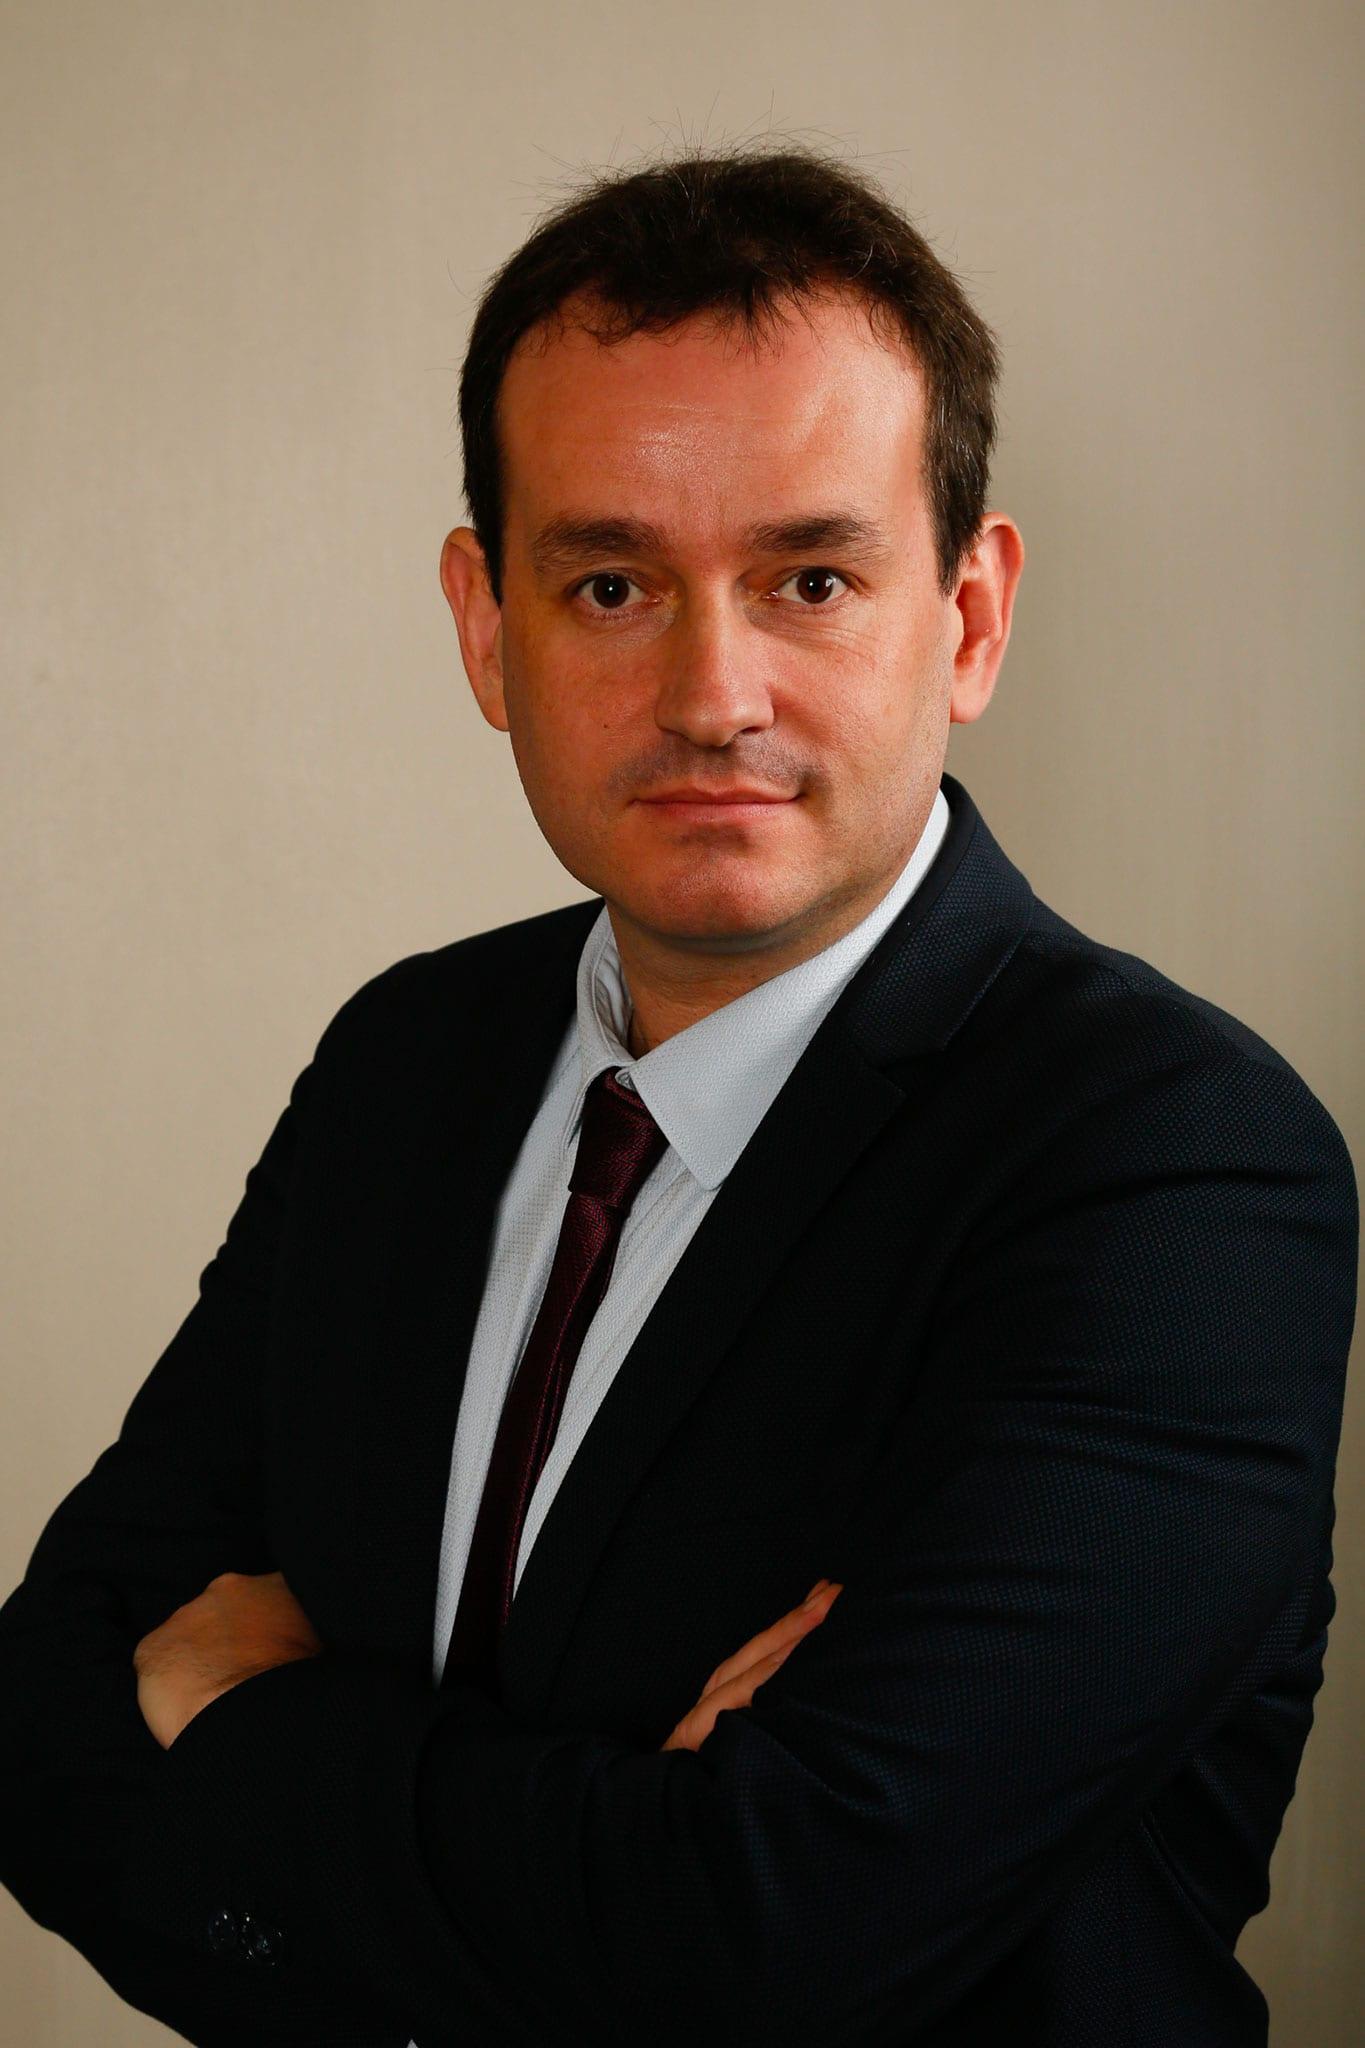 Christophe Kleine